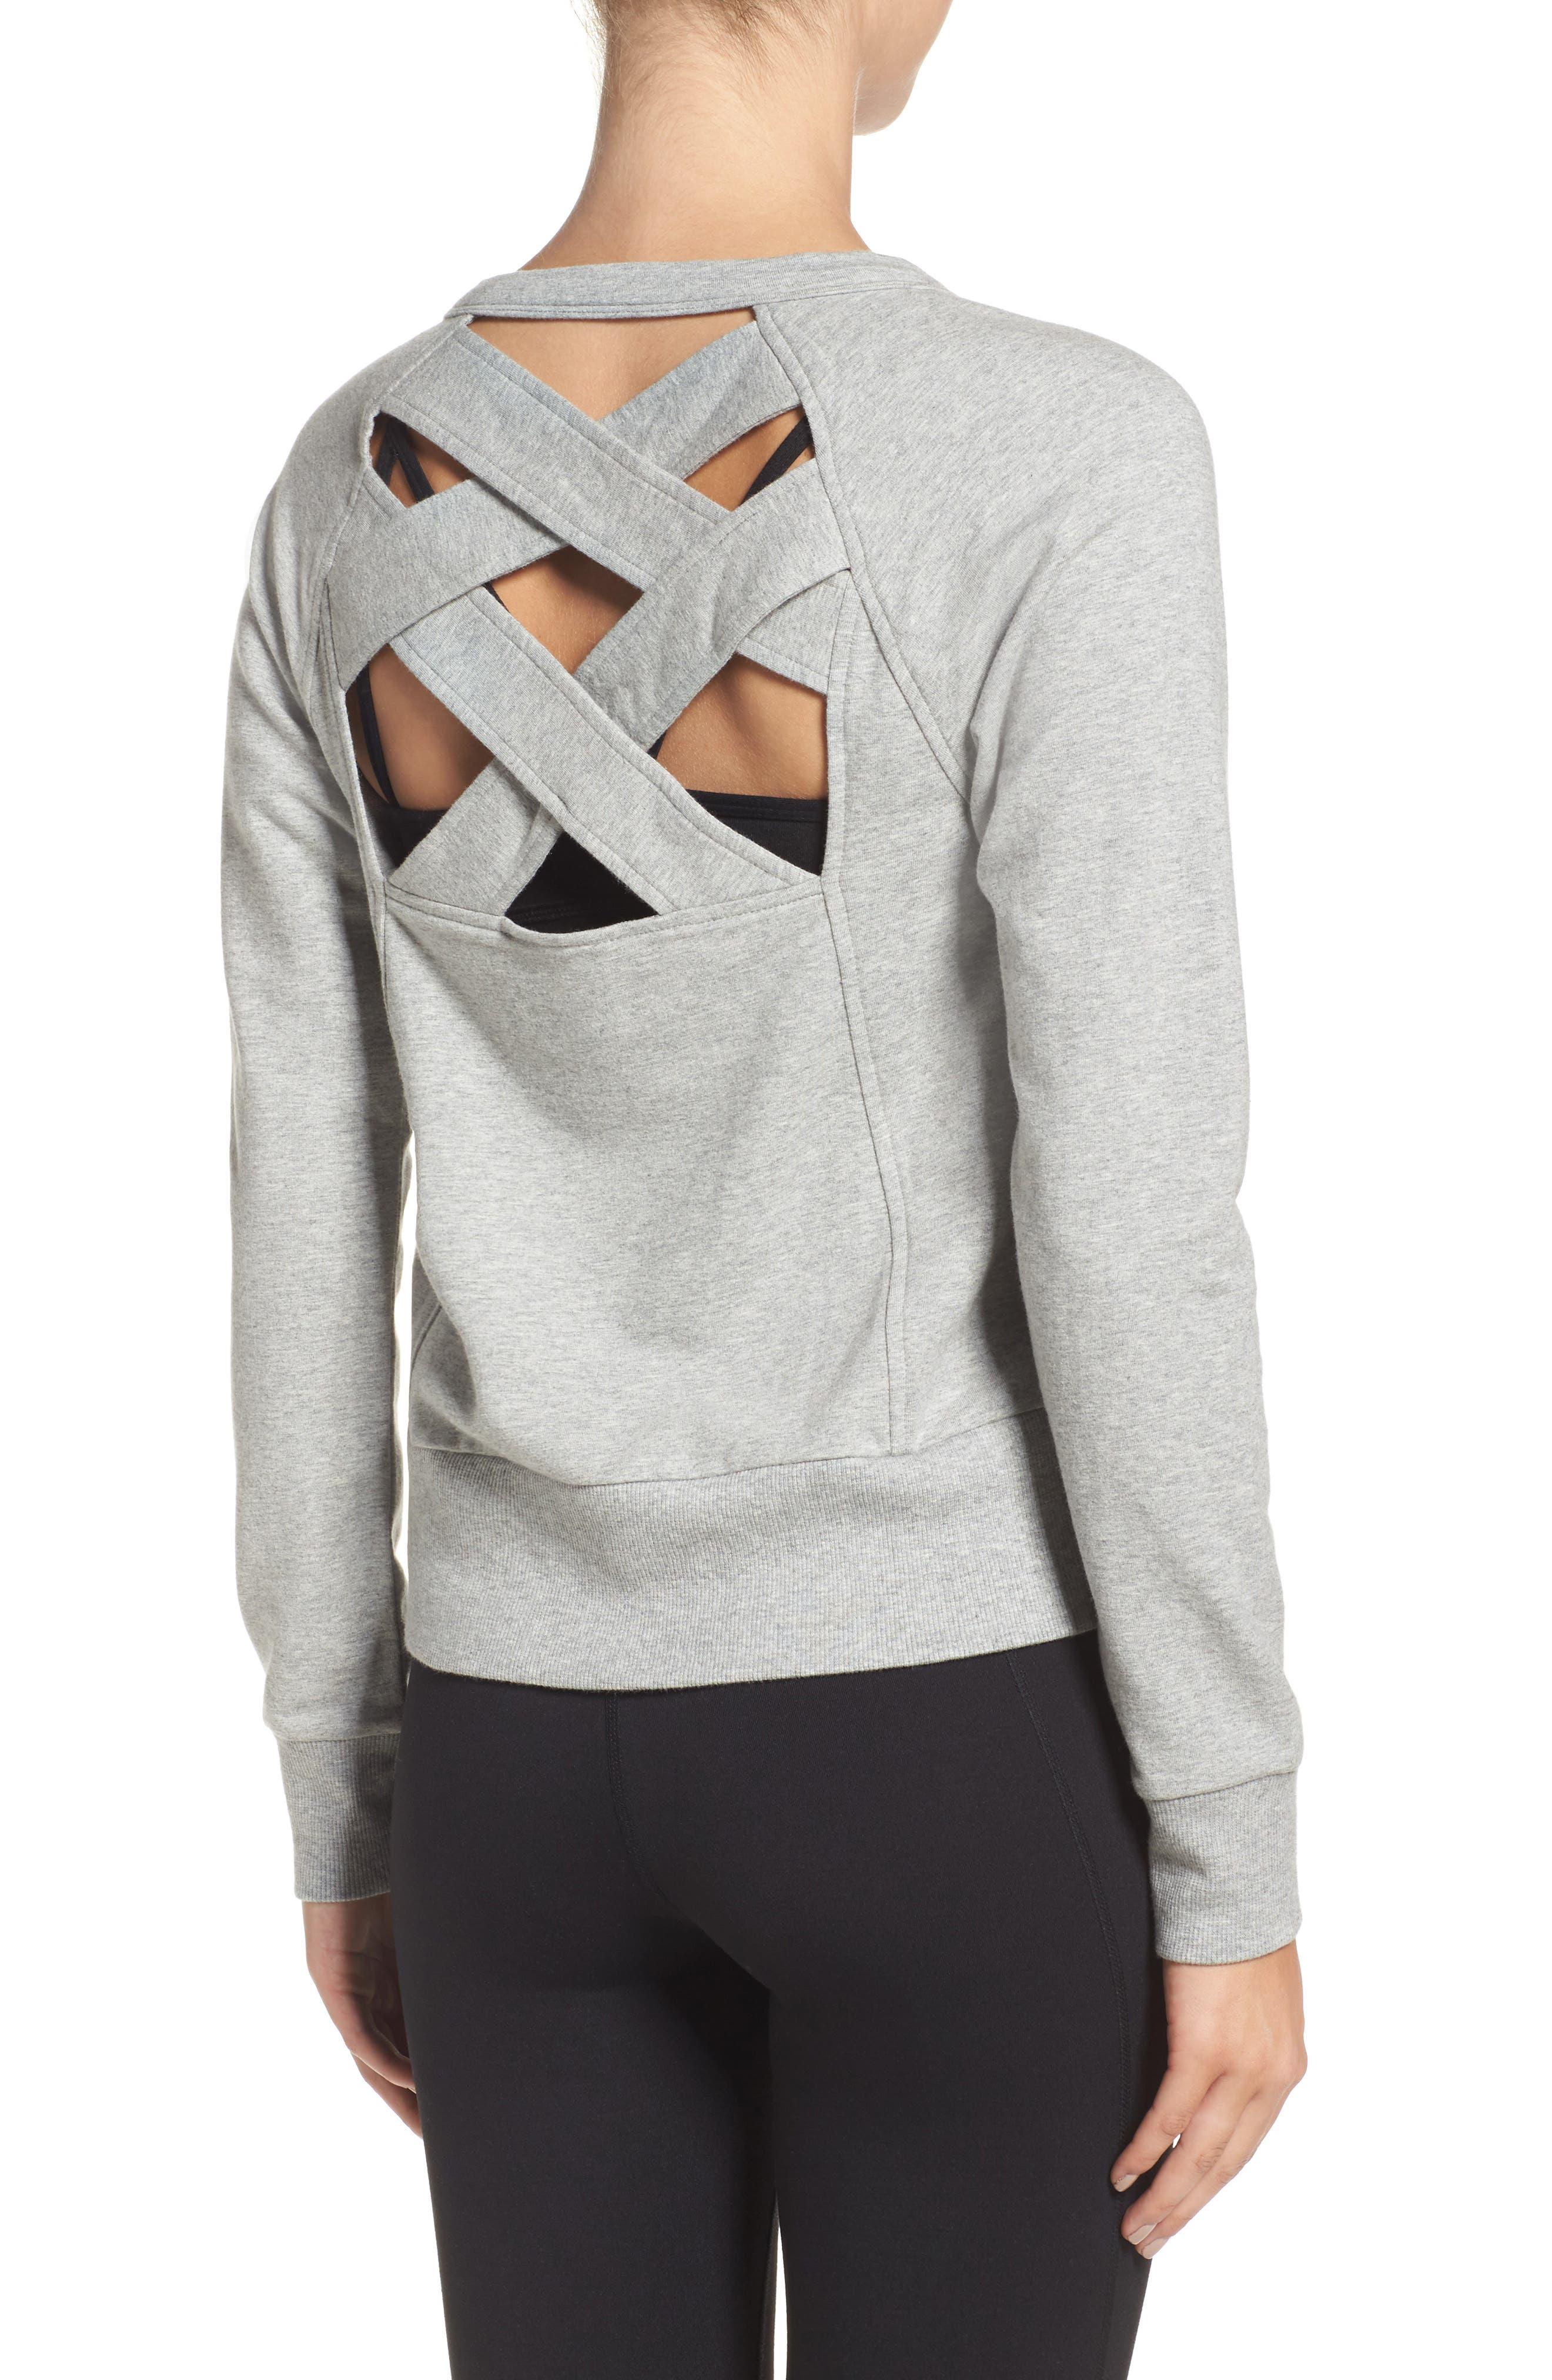 Alternate Image 1 Selected - Zella Covet Crisscross Sweatshirt